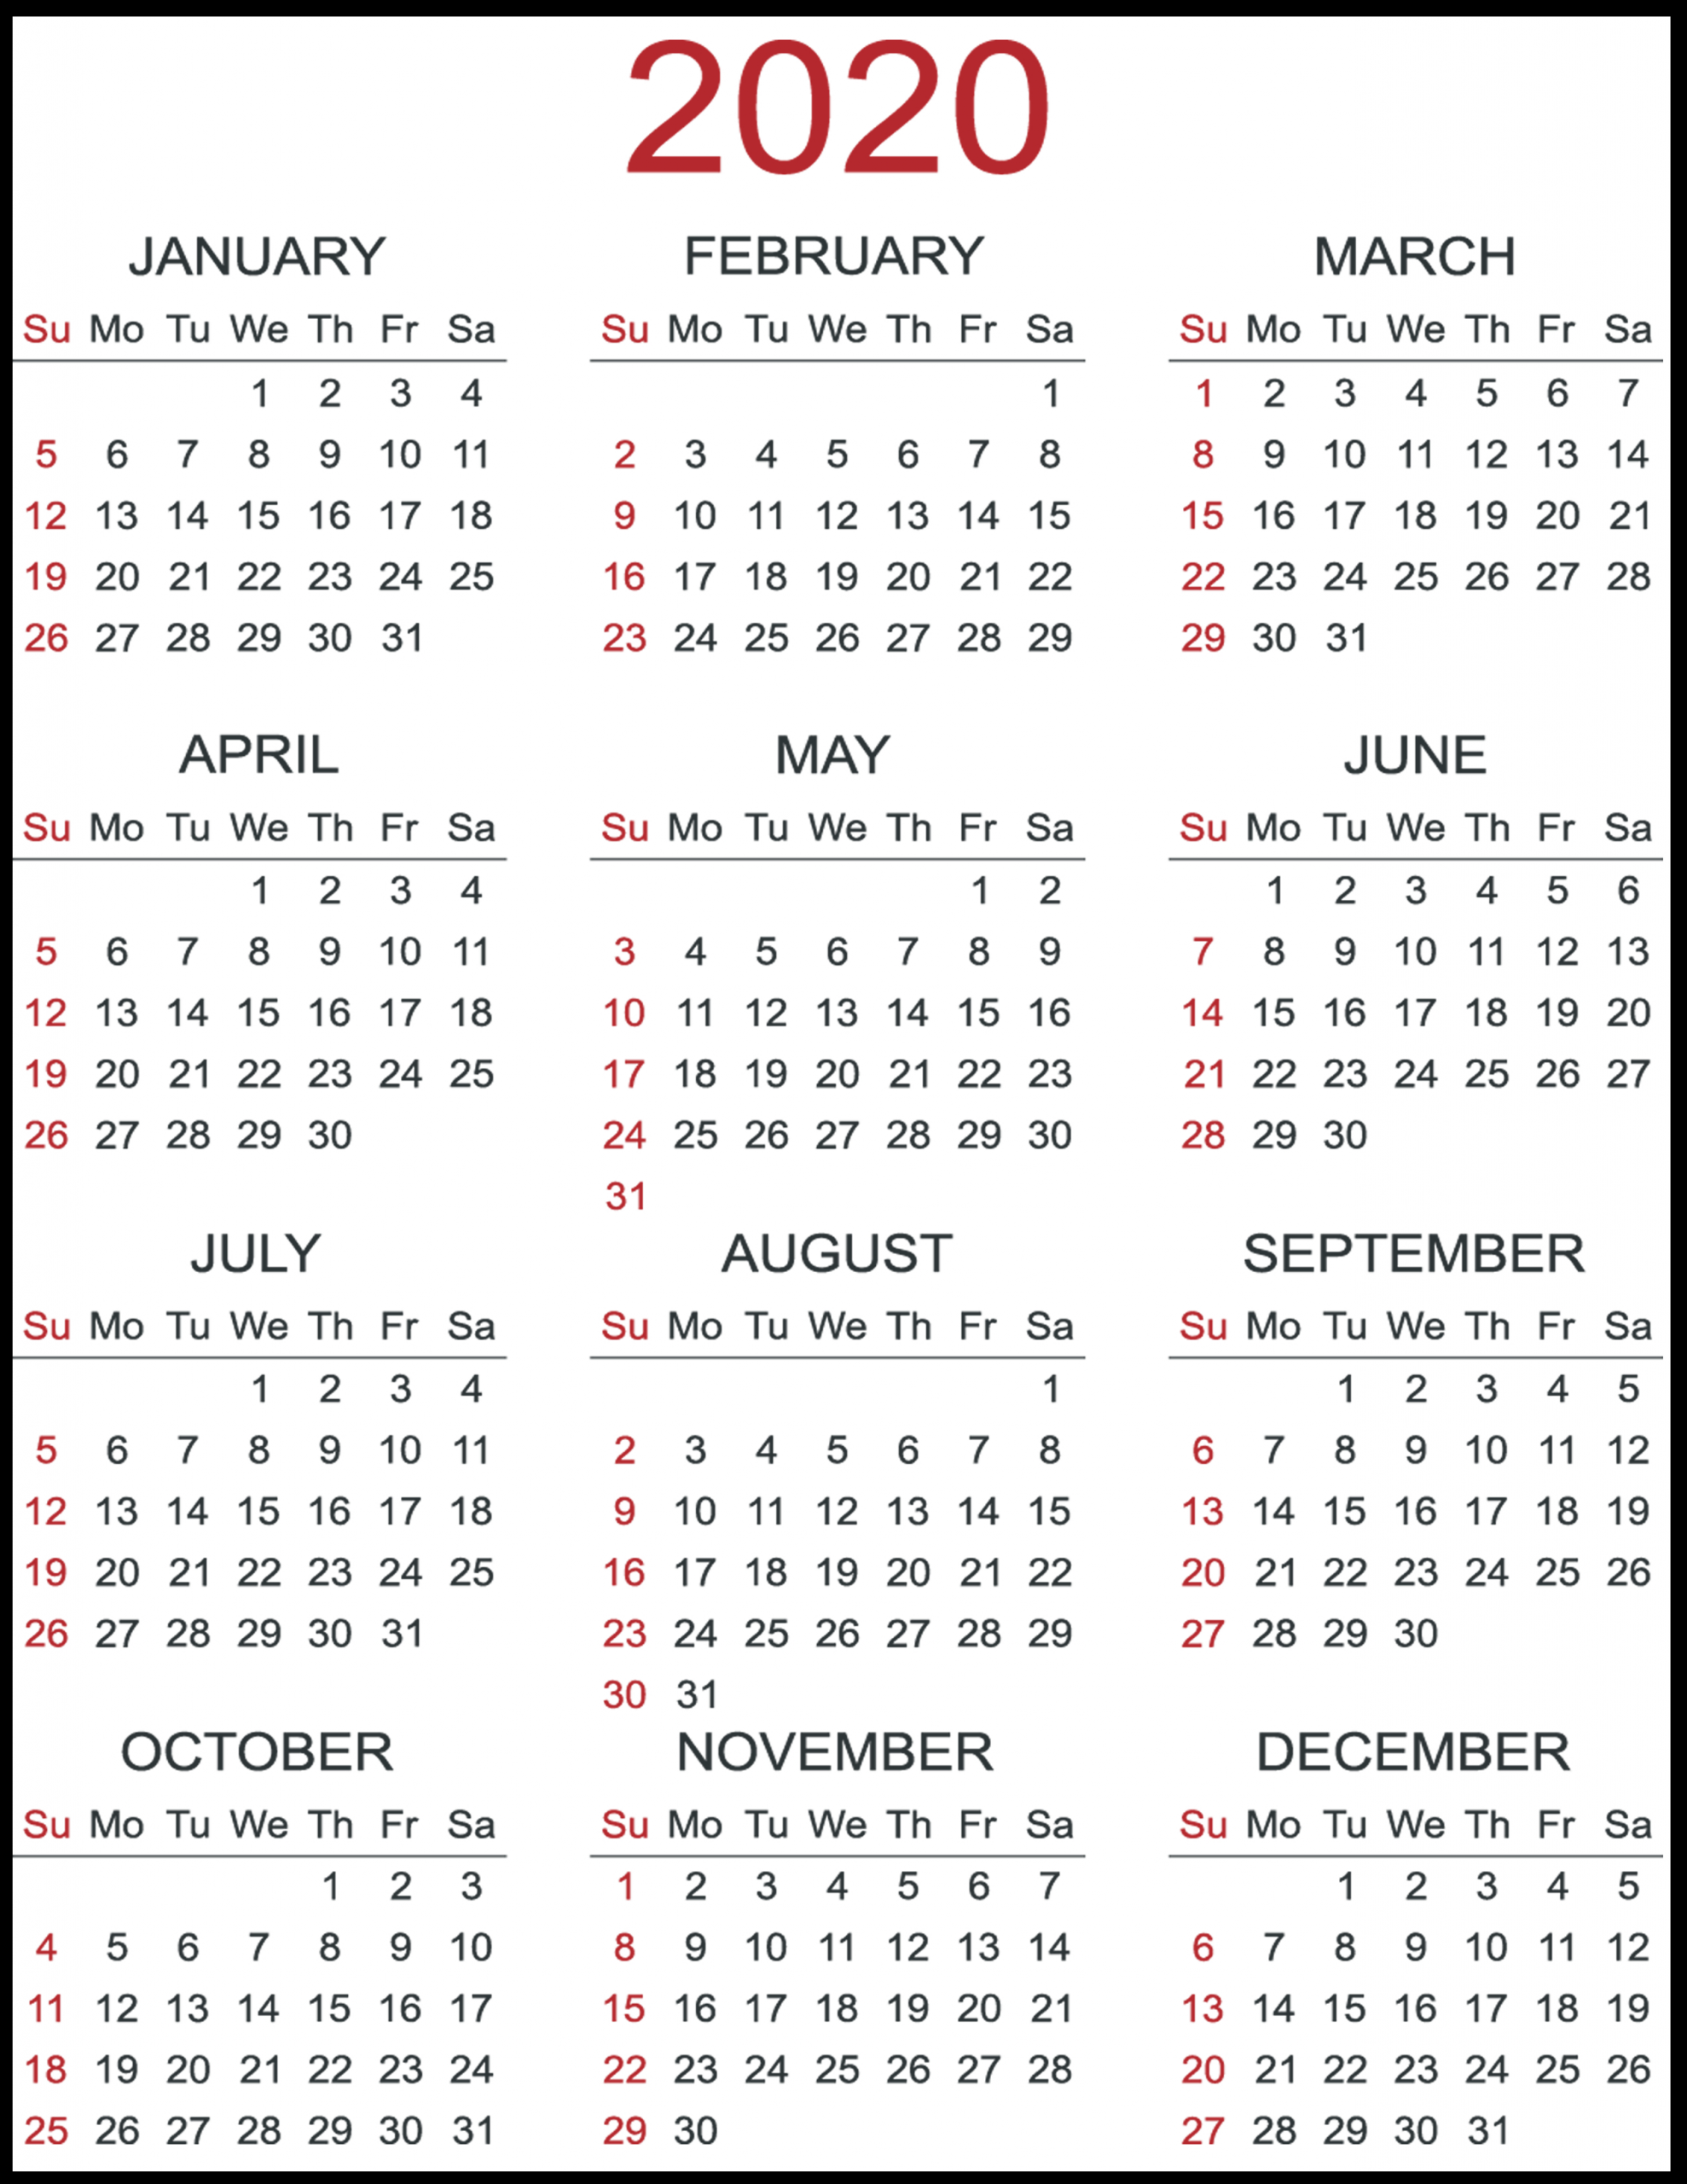 Free Printable 2020 Calendar Pdf - Togo.wpart.co